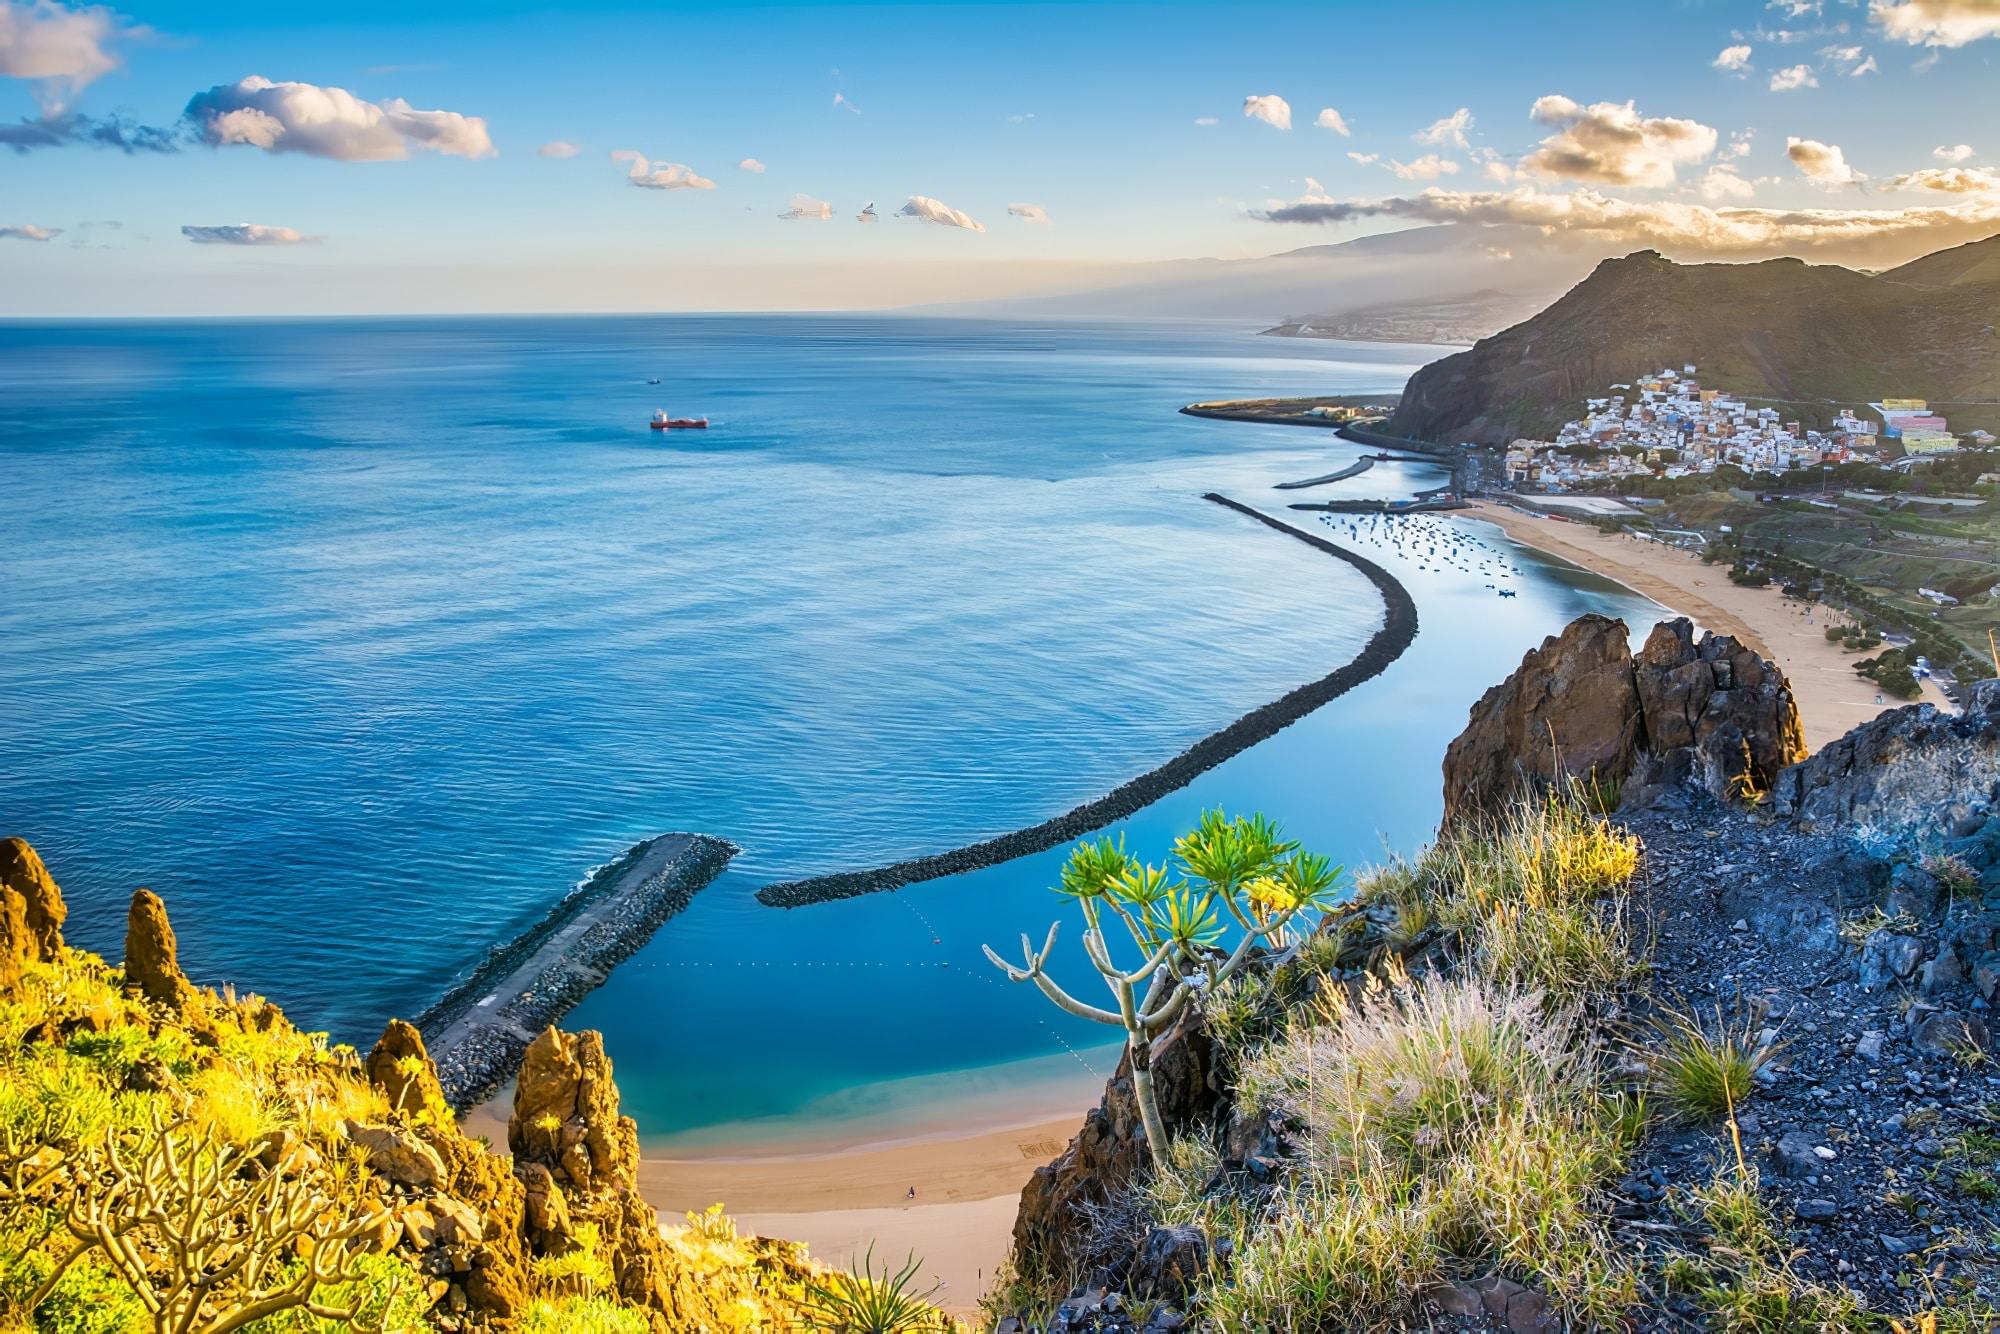 croisière observation baleines Tenerife